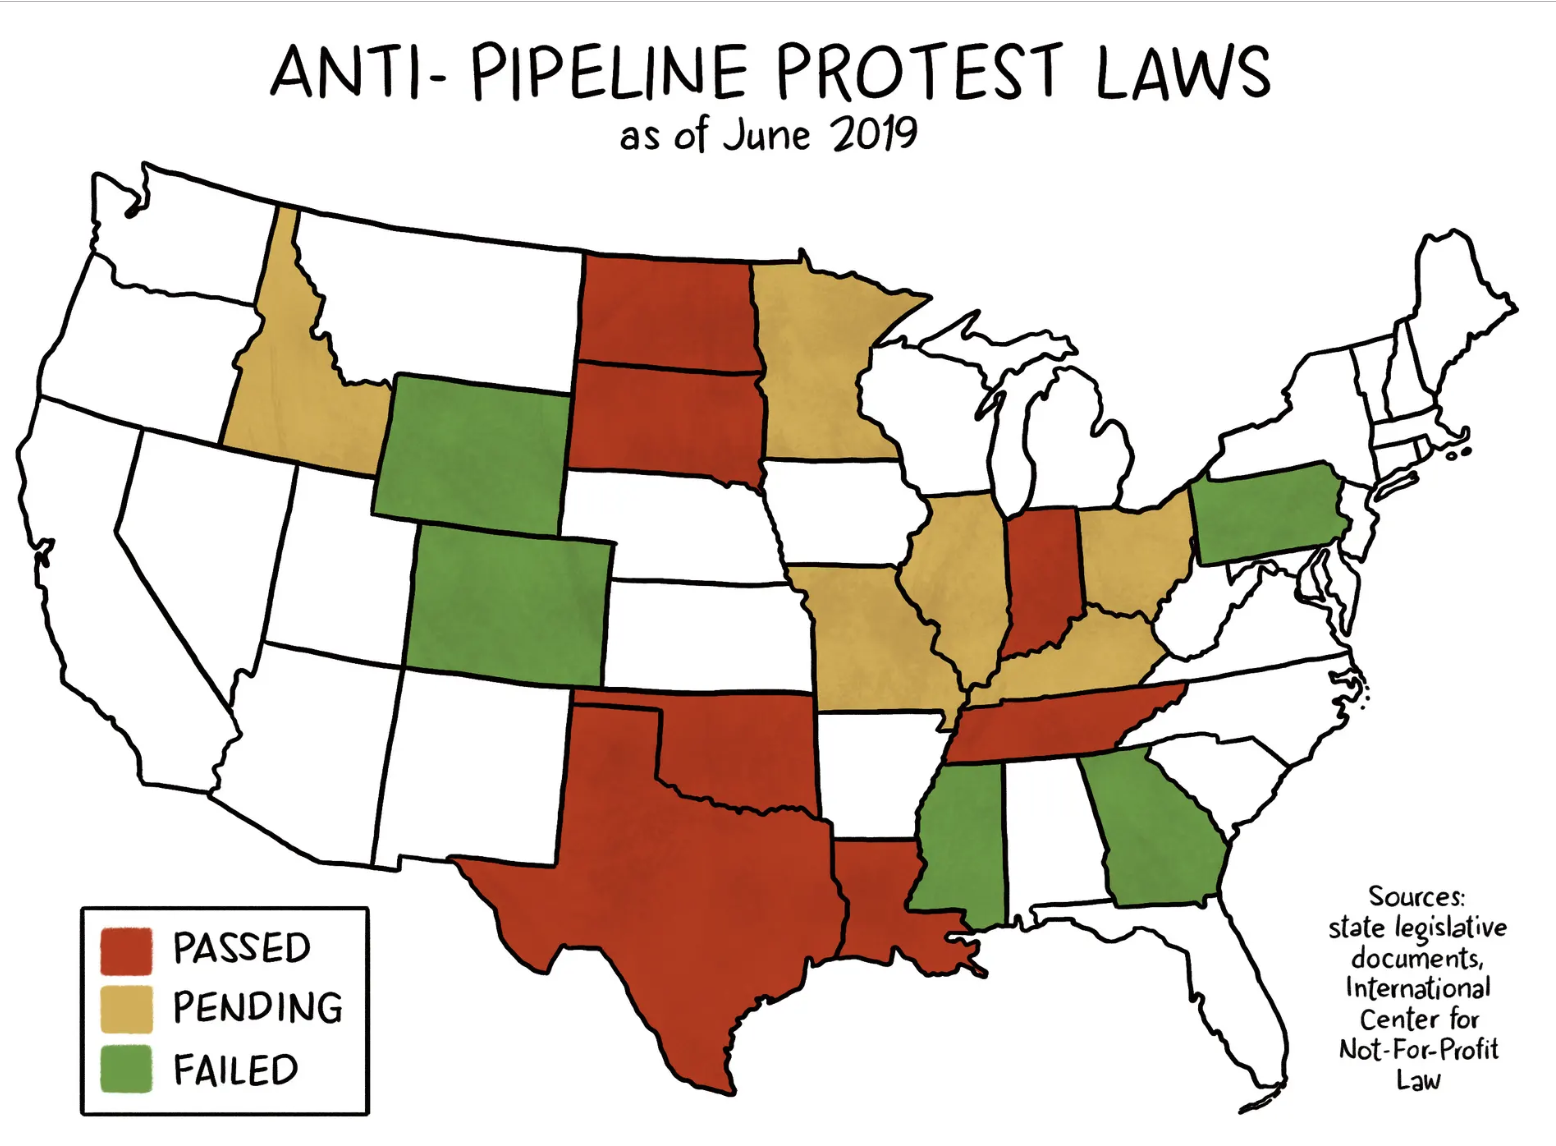 Antil Pipeline Laws 2019.png